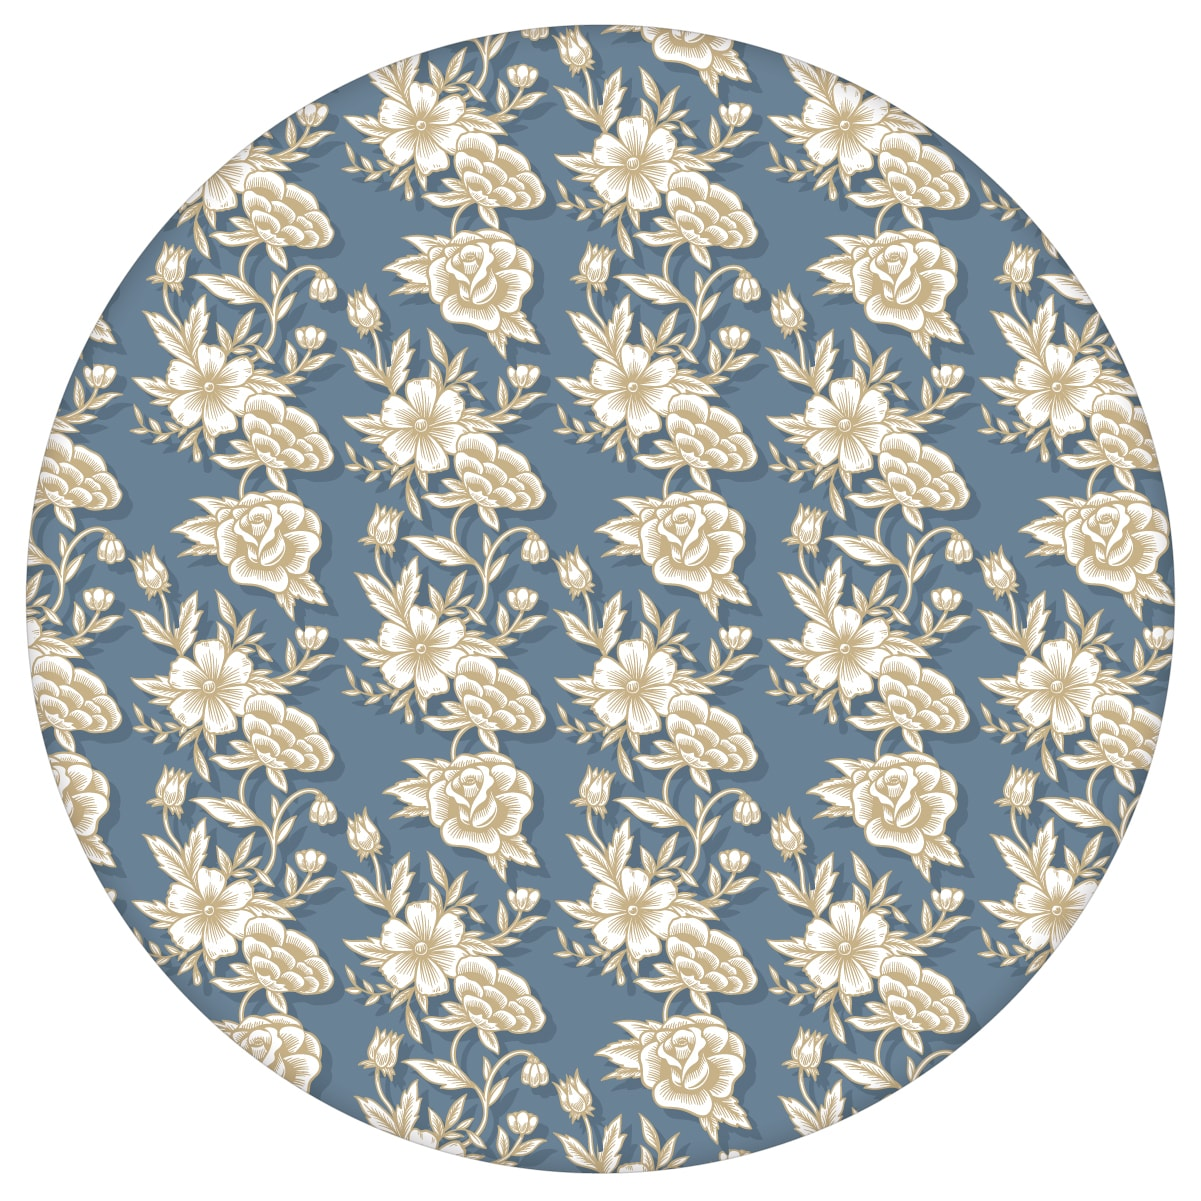 "Edle Blümchen Tapete ""Les fleurs du chateau"", blau beige Vlies Blumentapete, Wohnakzent, Wanddeko für Flur, Büro  3"